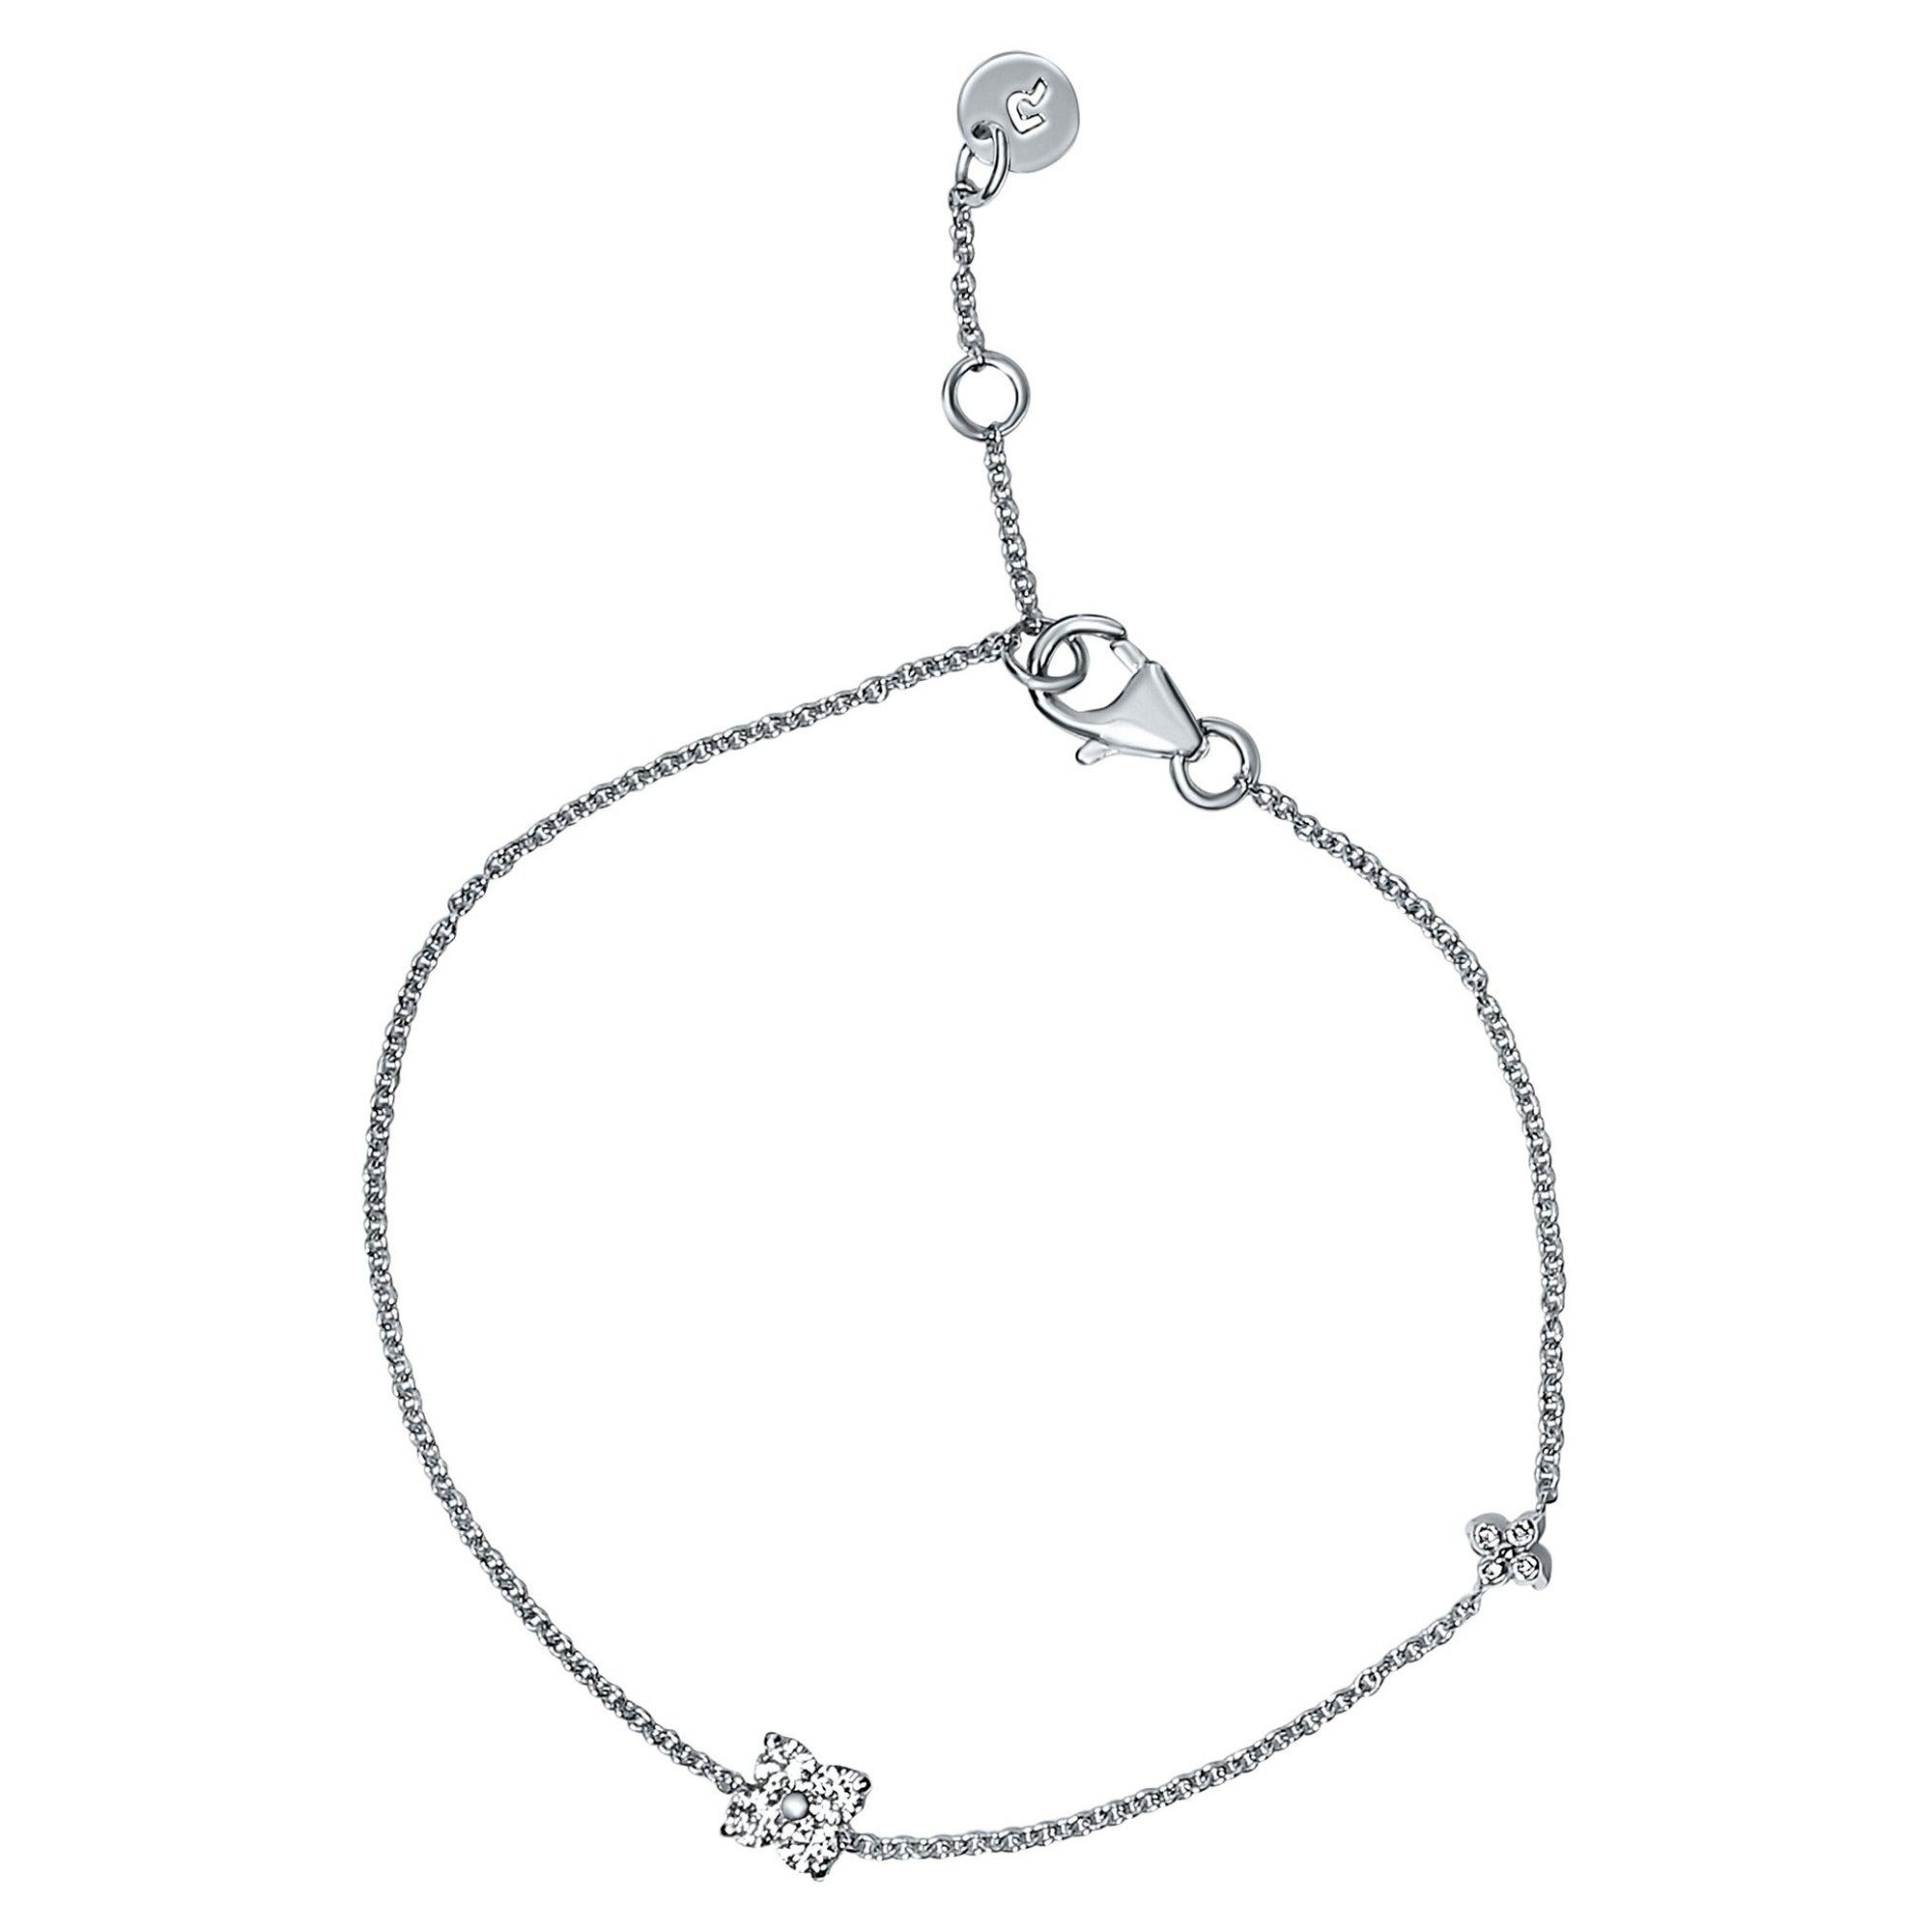 0.24 Carat Diamond Flower Petal Bracelet in 14 Karat White Gold, Shlomit Rogel